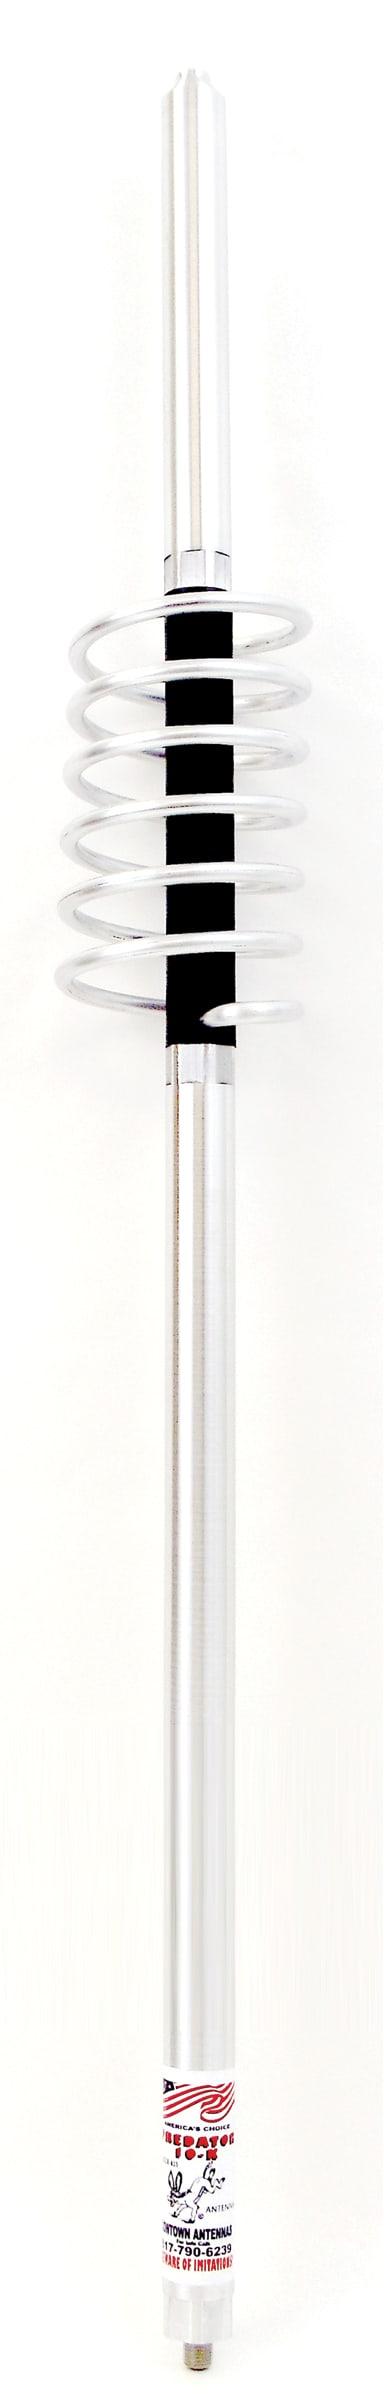 K117 - 10,000 Watt Predator Antenna